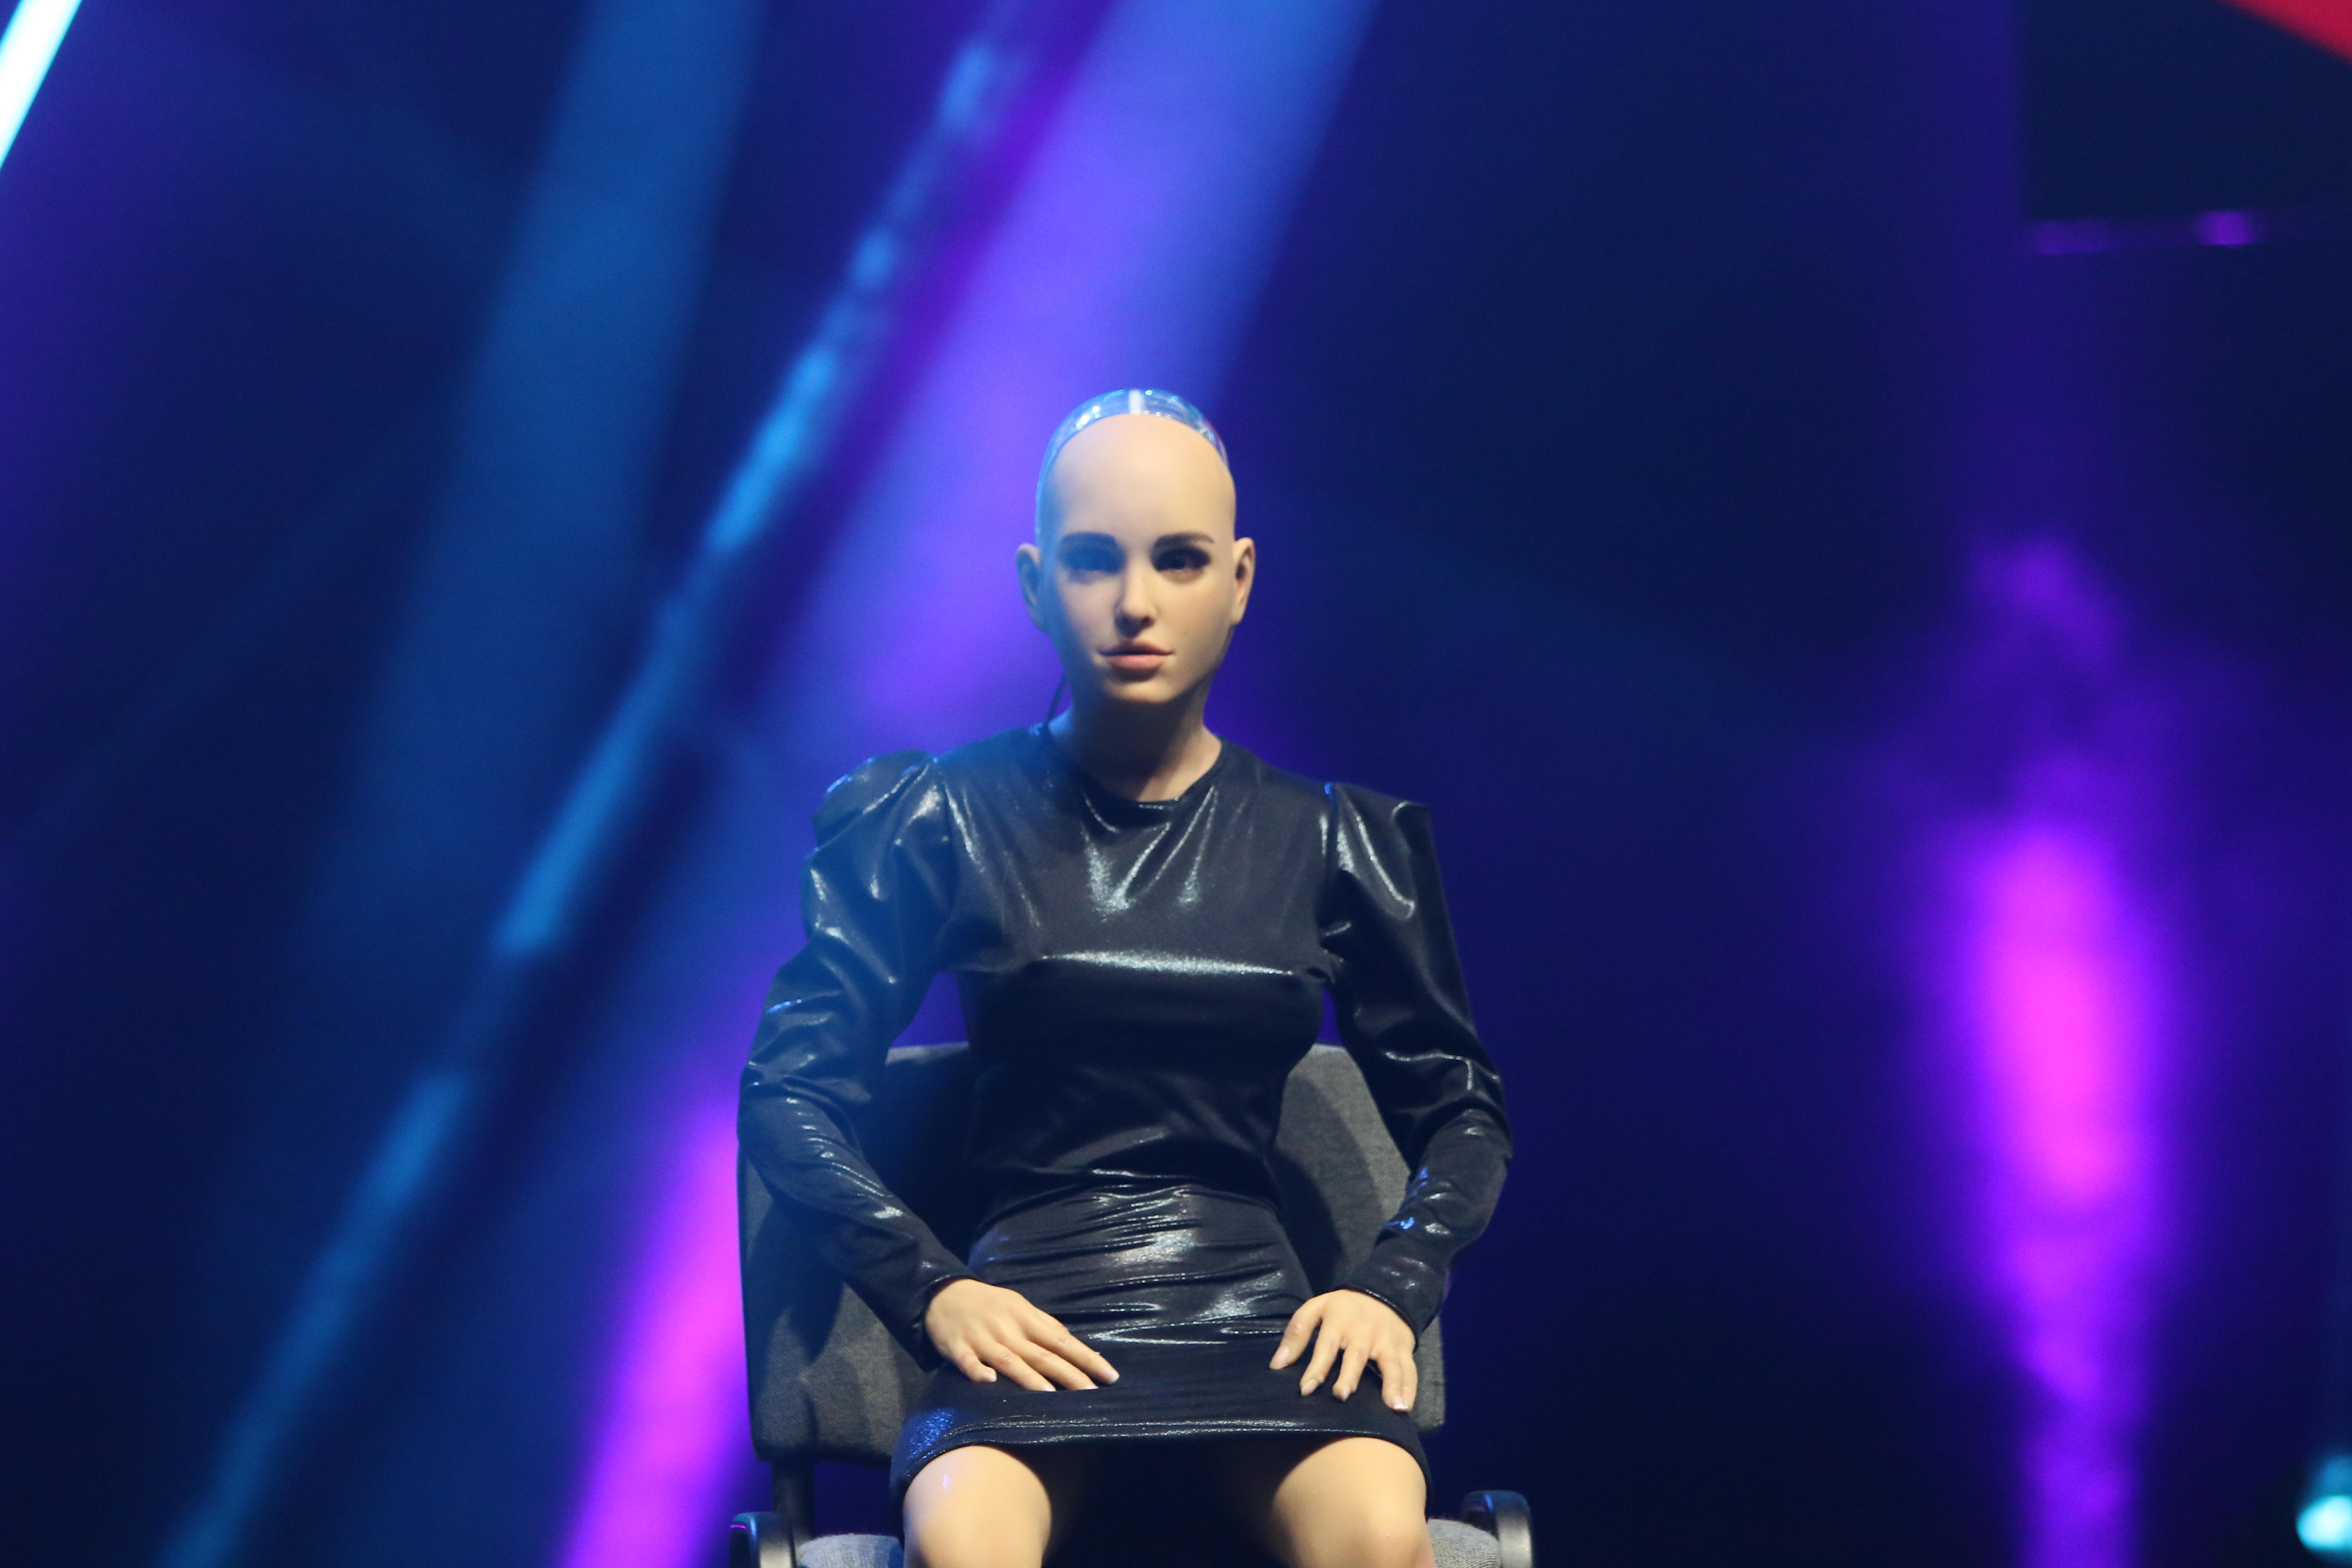 Първият робот-компаньон Harmony.